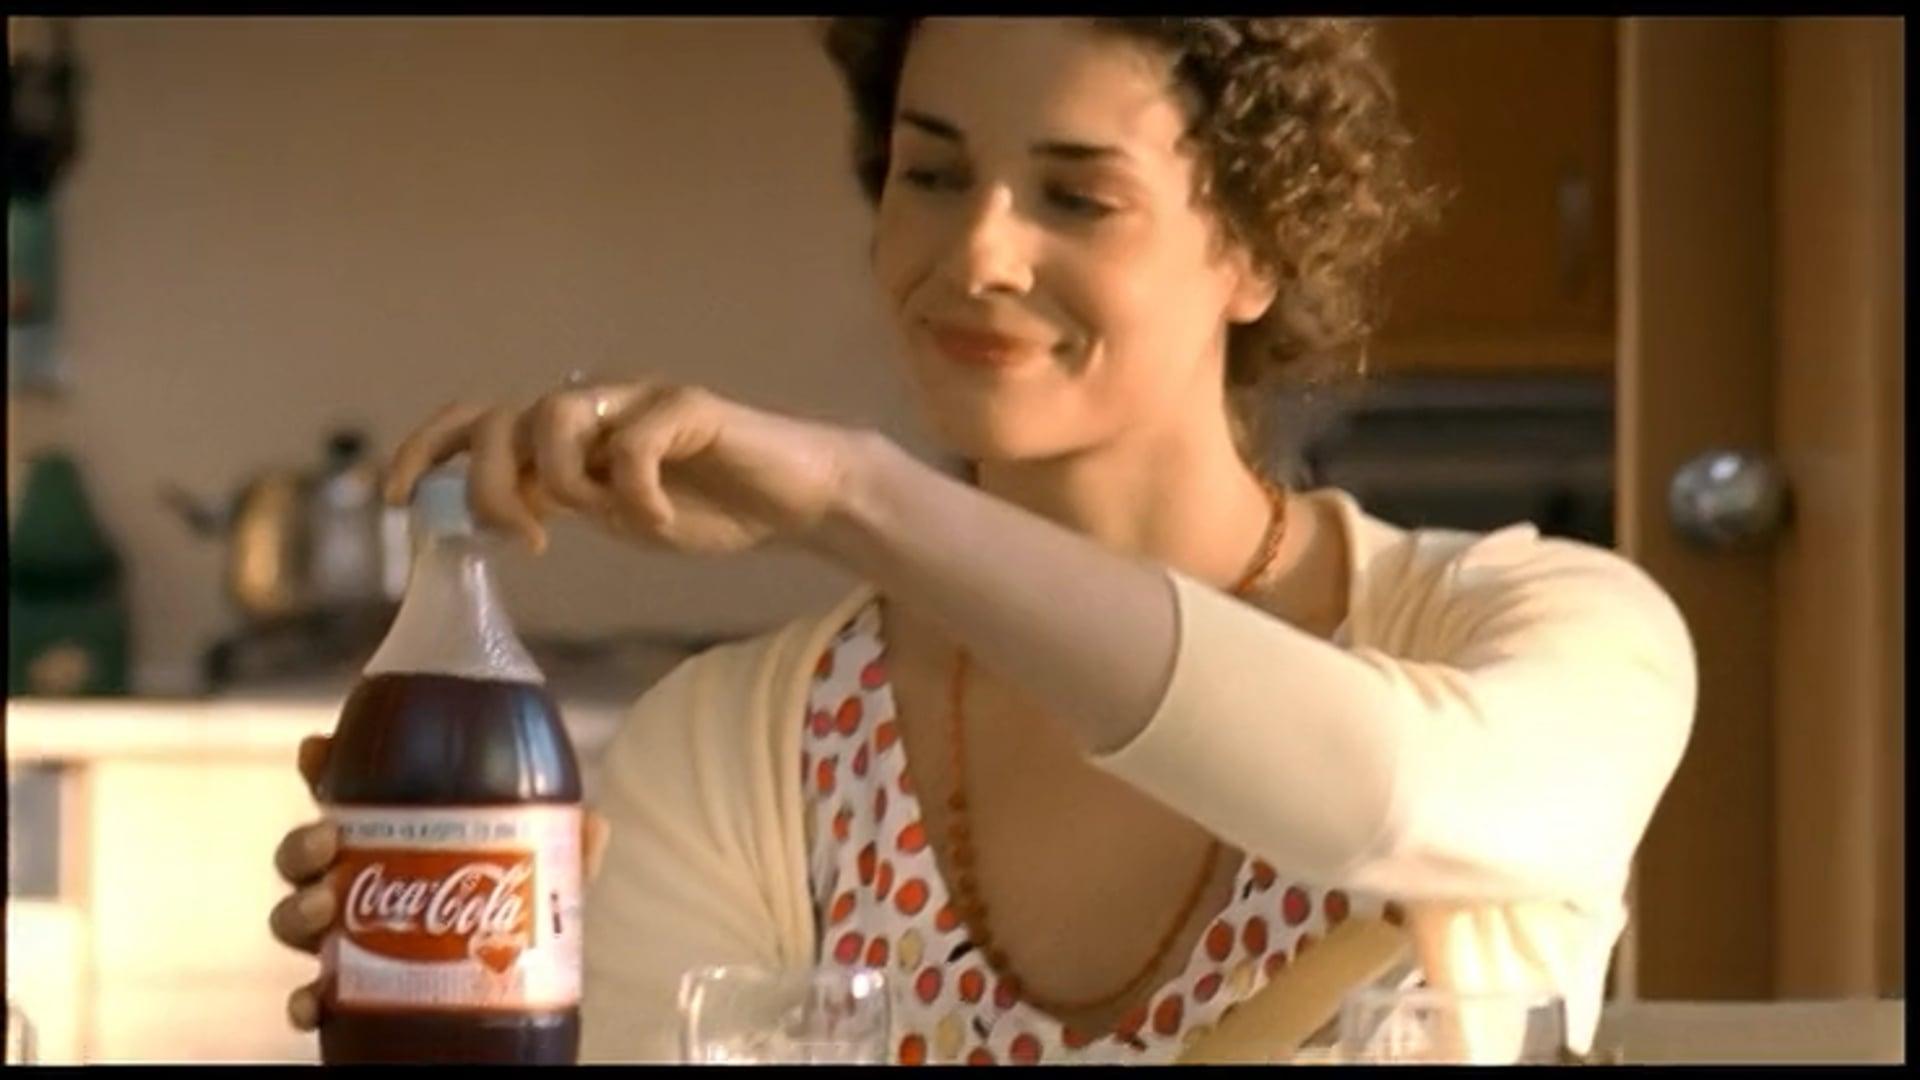 Umut Aral - Coca Cola Door